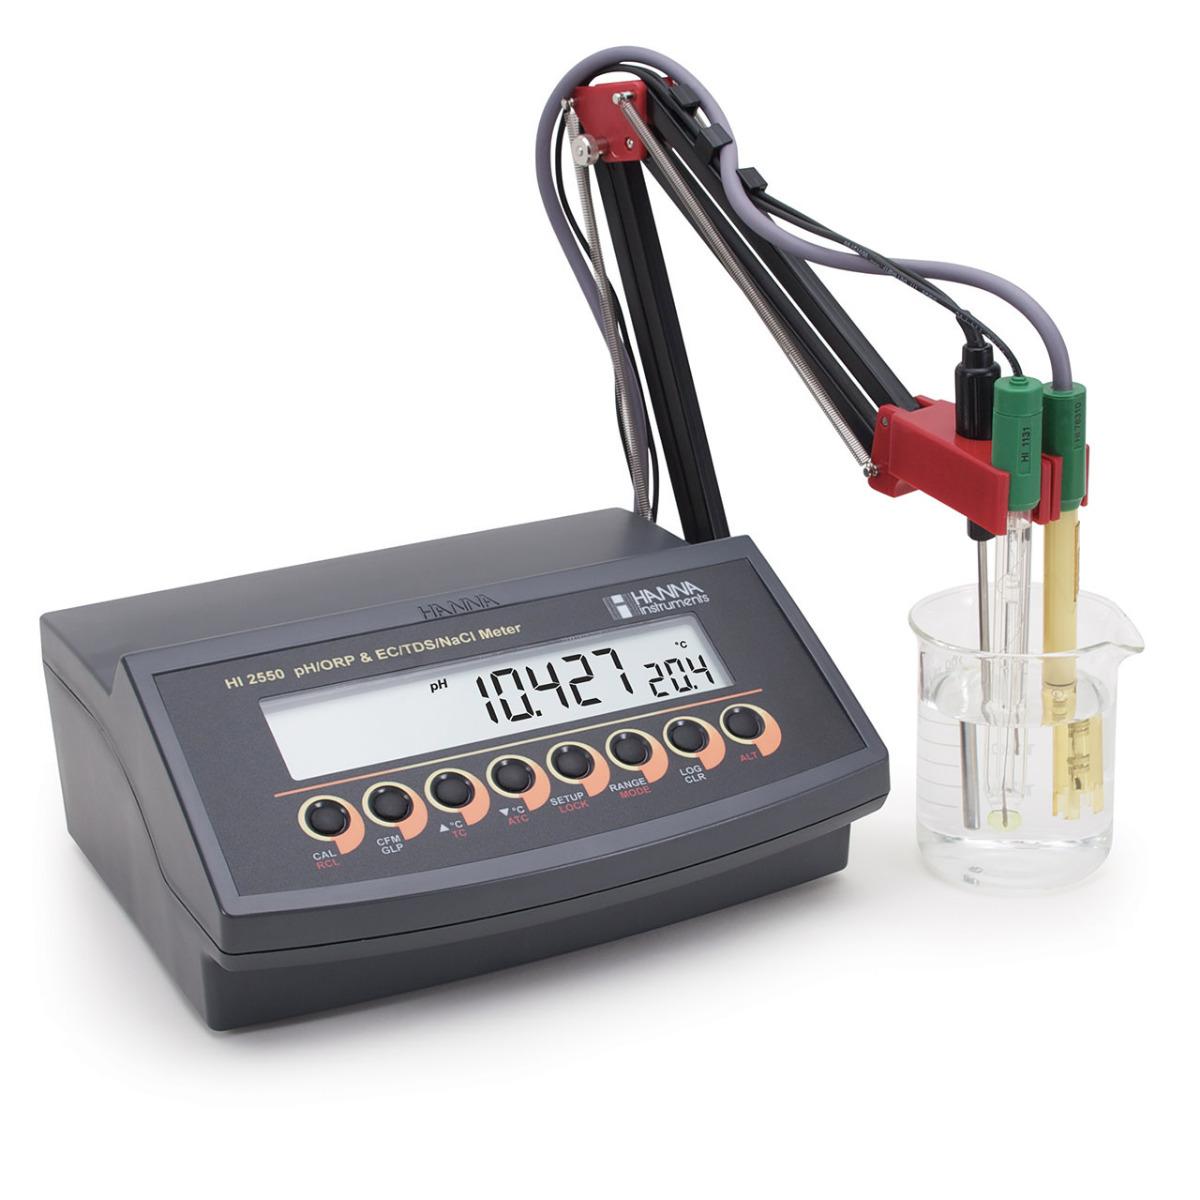 HI2550 Multiparameter pH/ORP/ISE and EC/TDS/Salinity Benchtop Meter